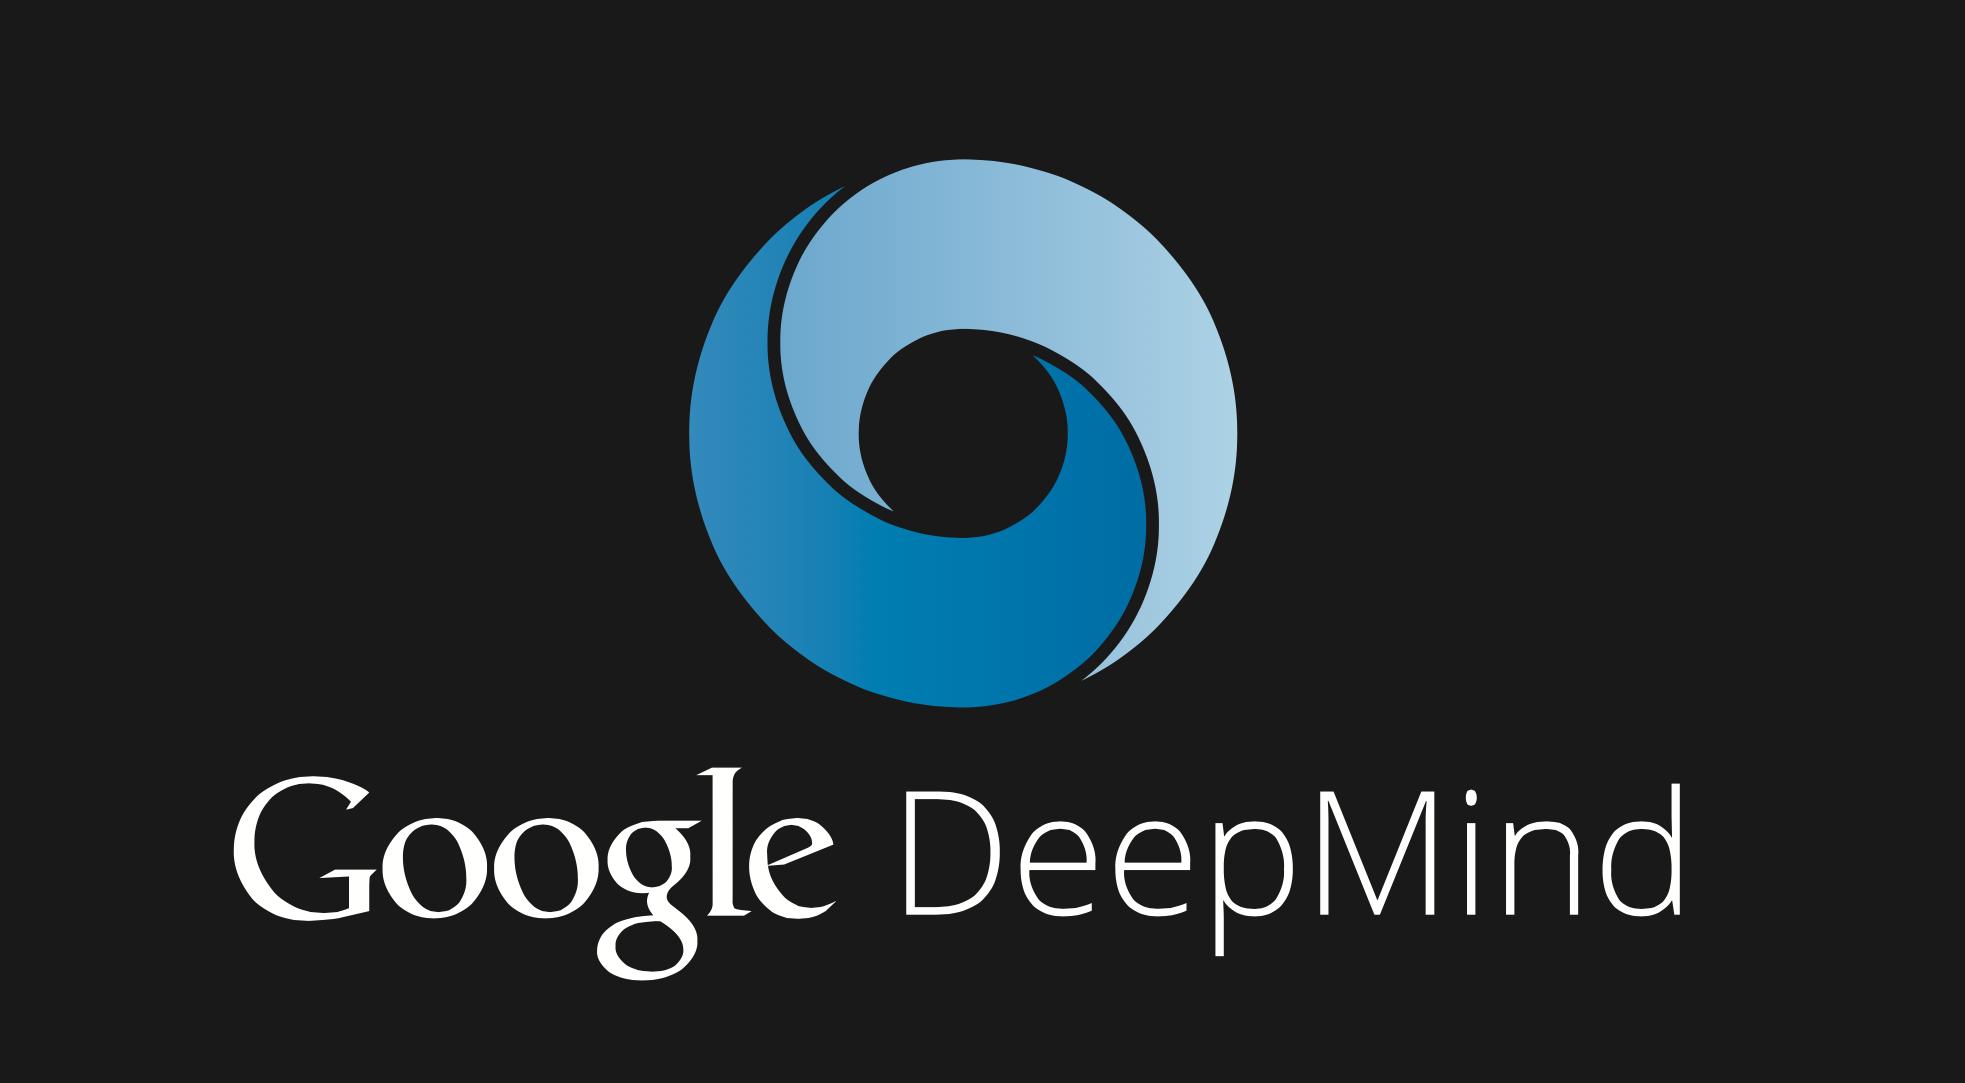 Google's DeepMind Artificial Intelligence gets Human-like ... Arnold Schwarzenegger Google